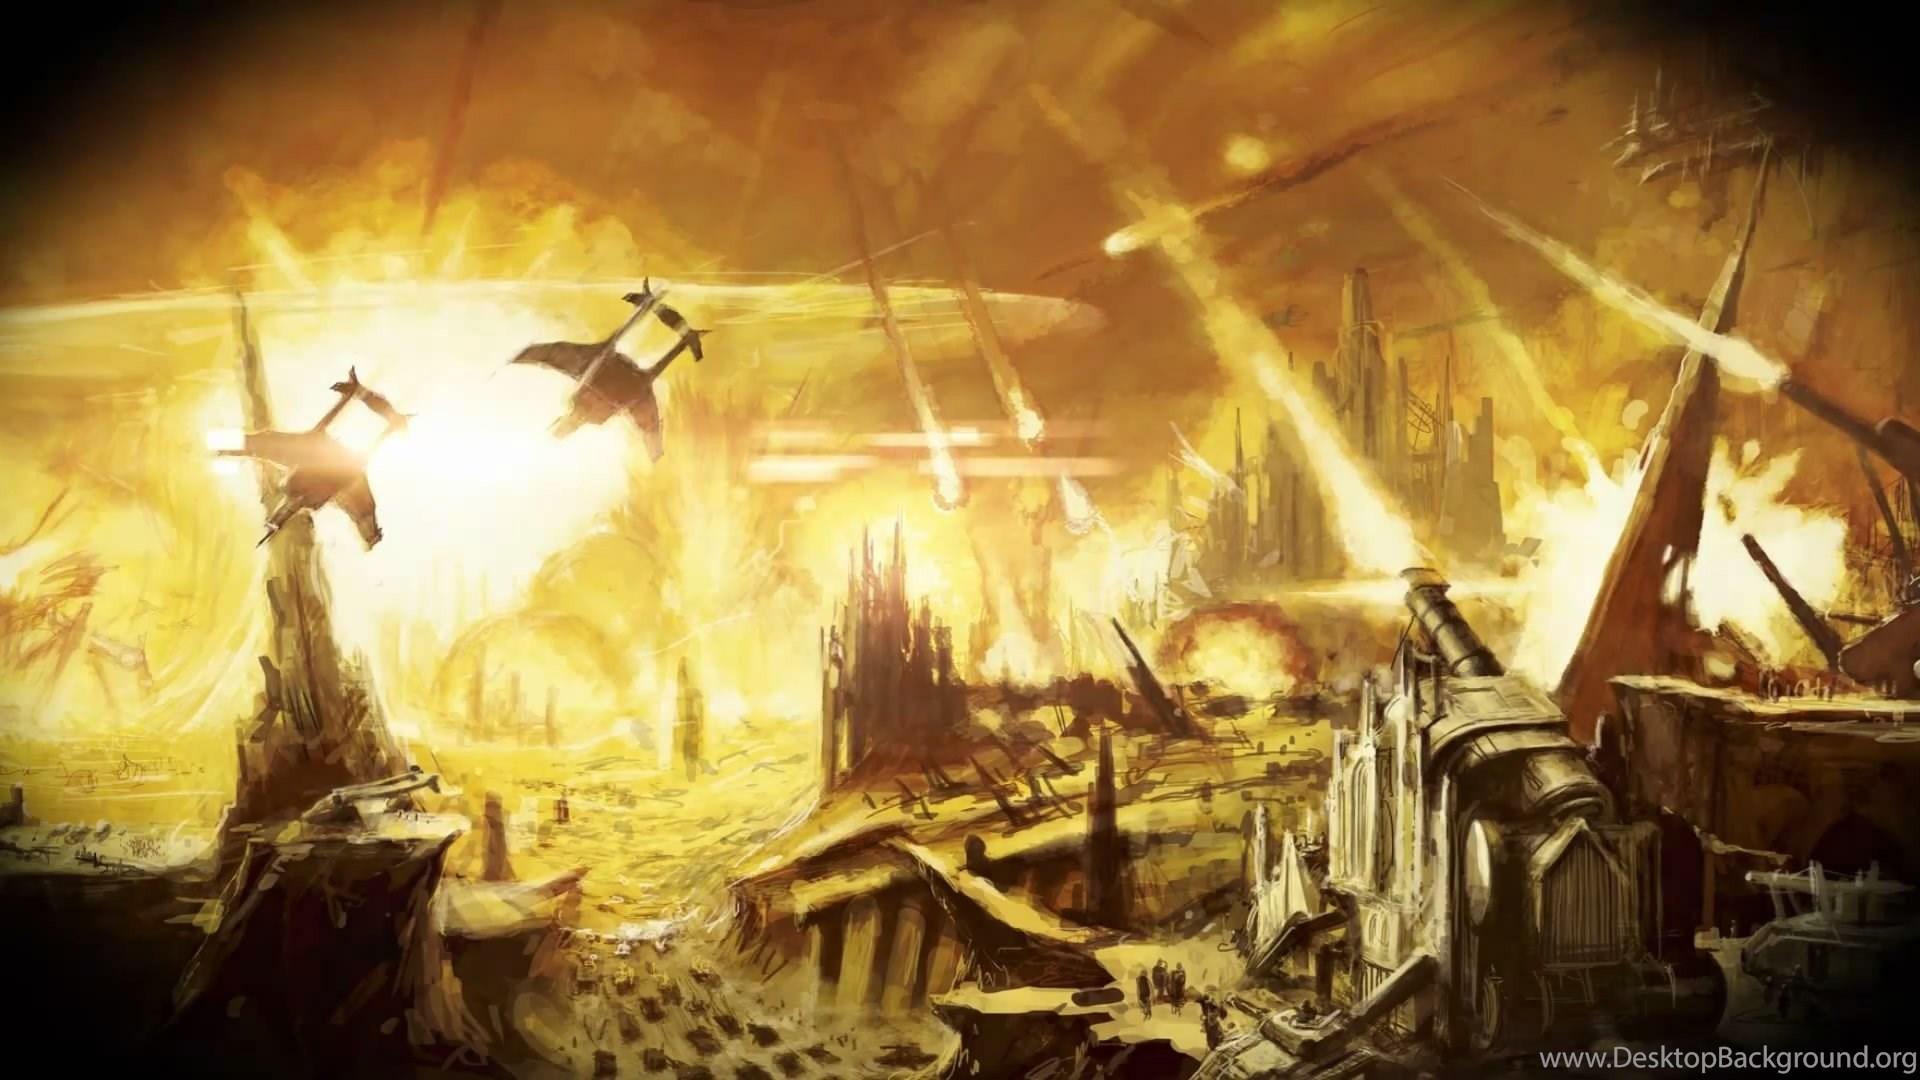 Warhammer 40k Imperial Guard Wallpapers Walldevil Best Free Hd